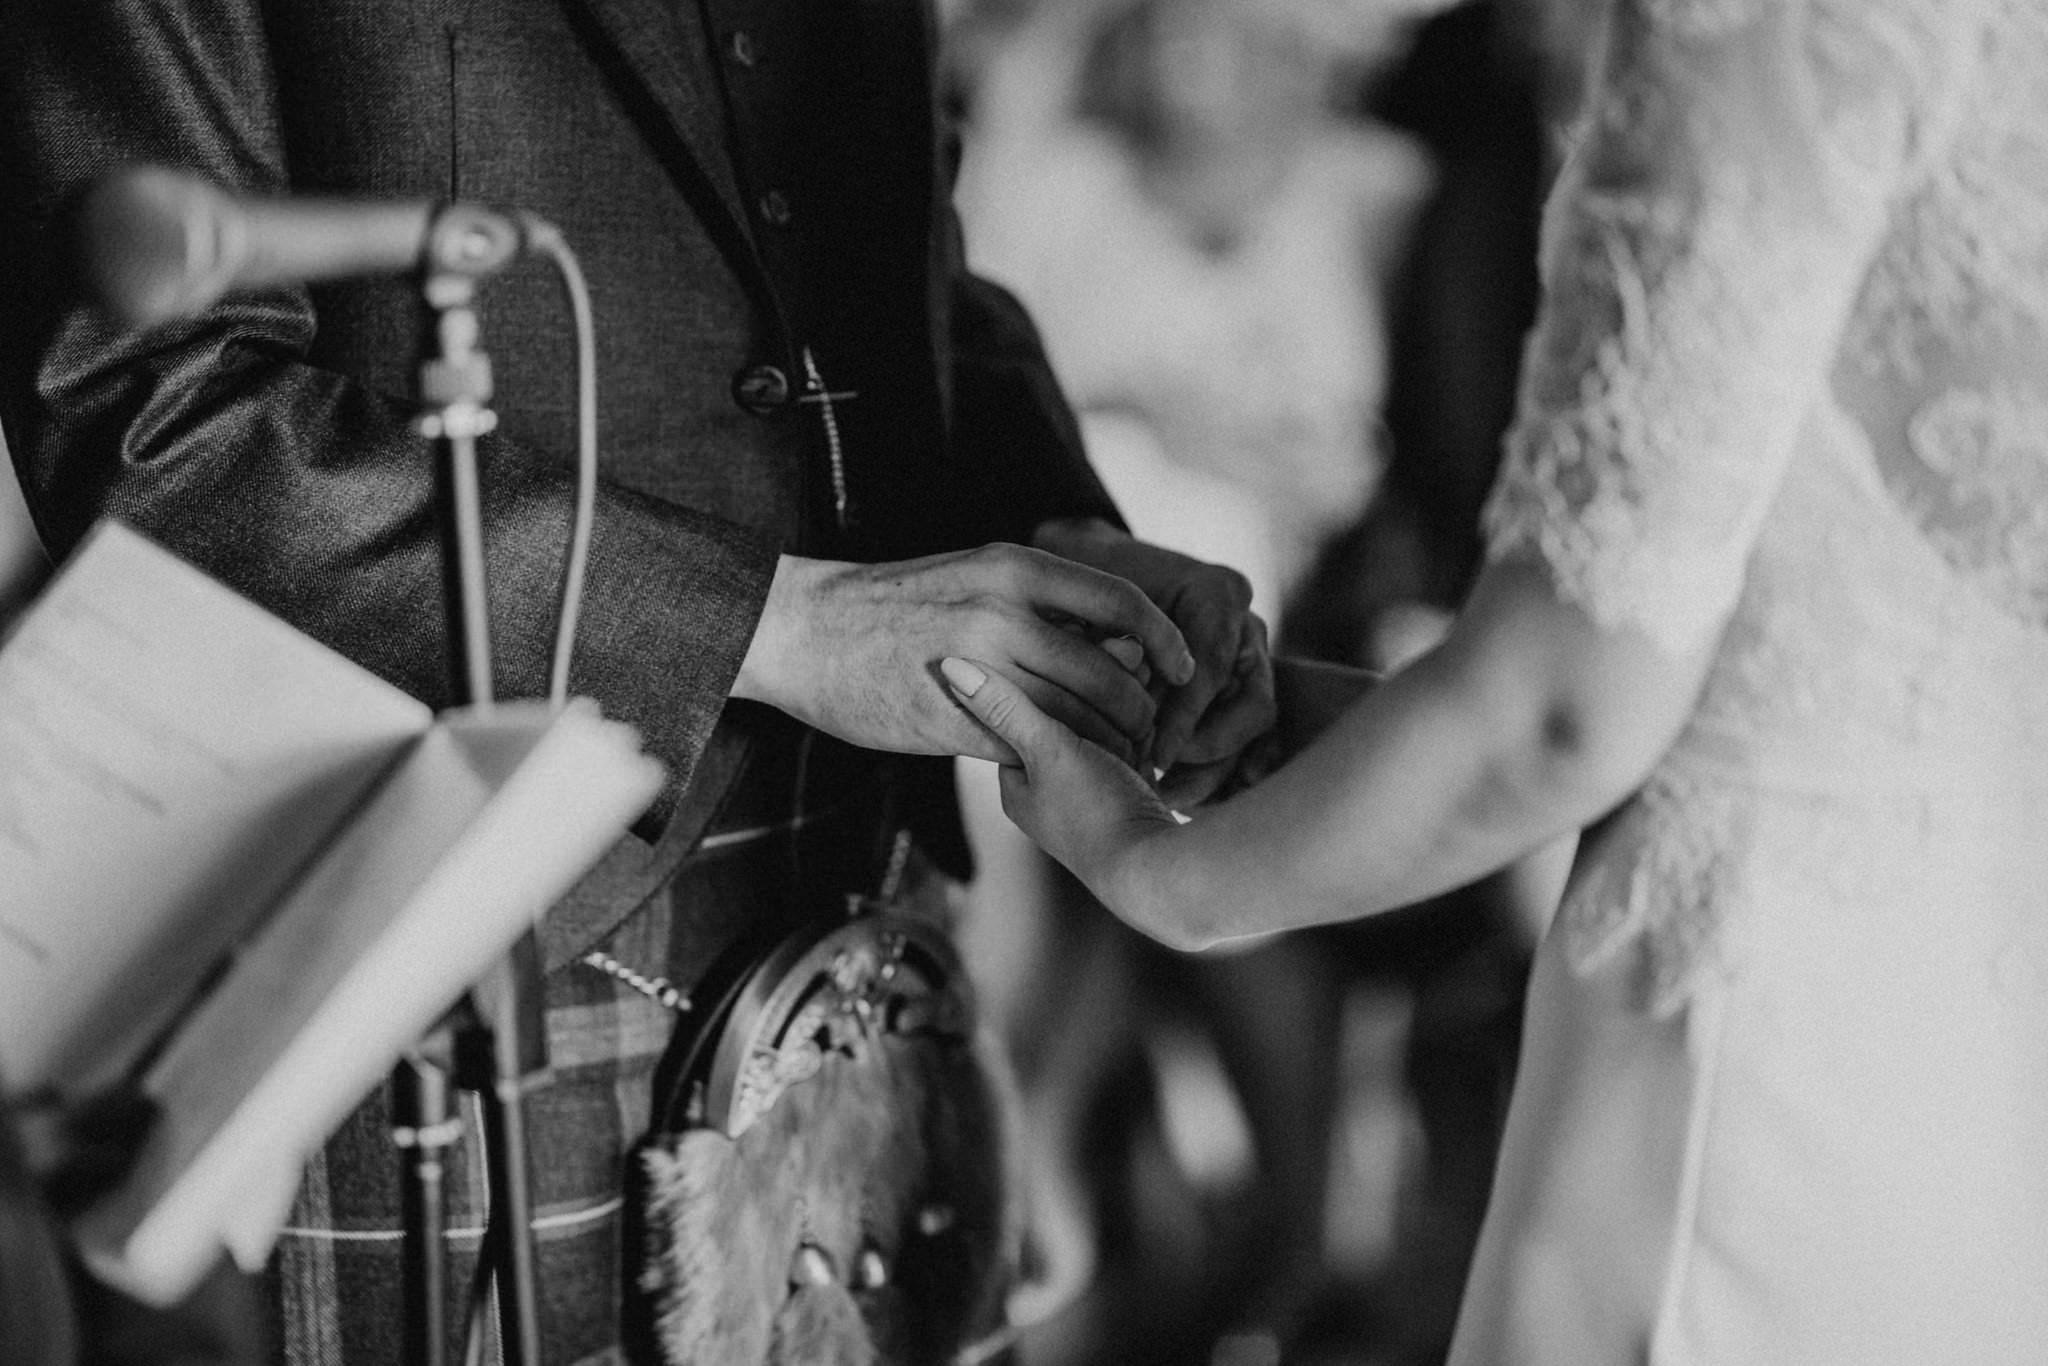 kirknewton stables wedding photographer (34).jpg